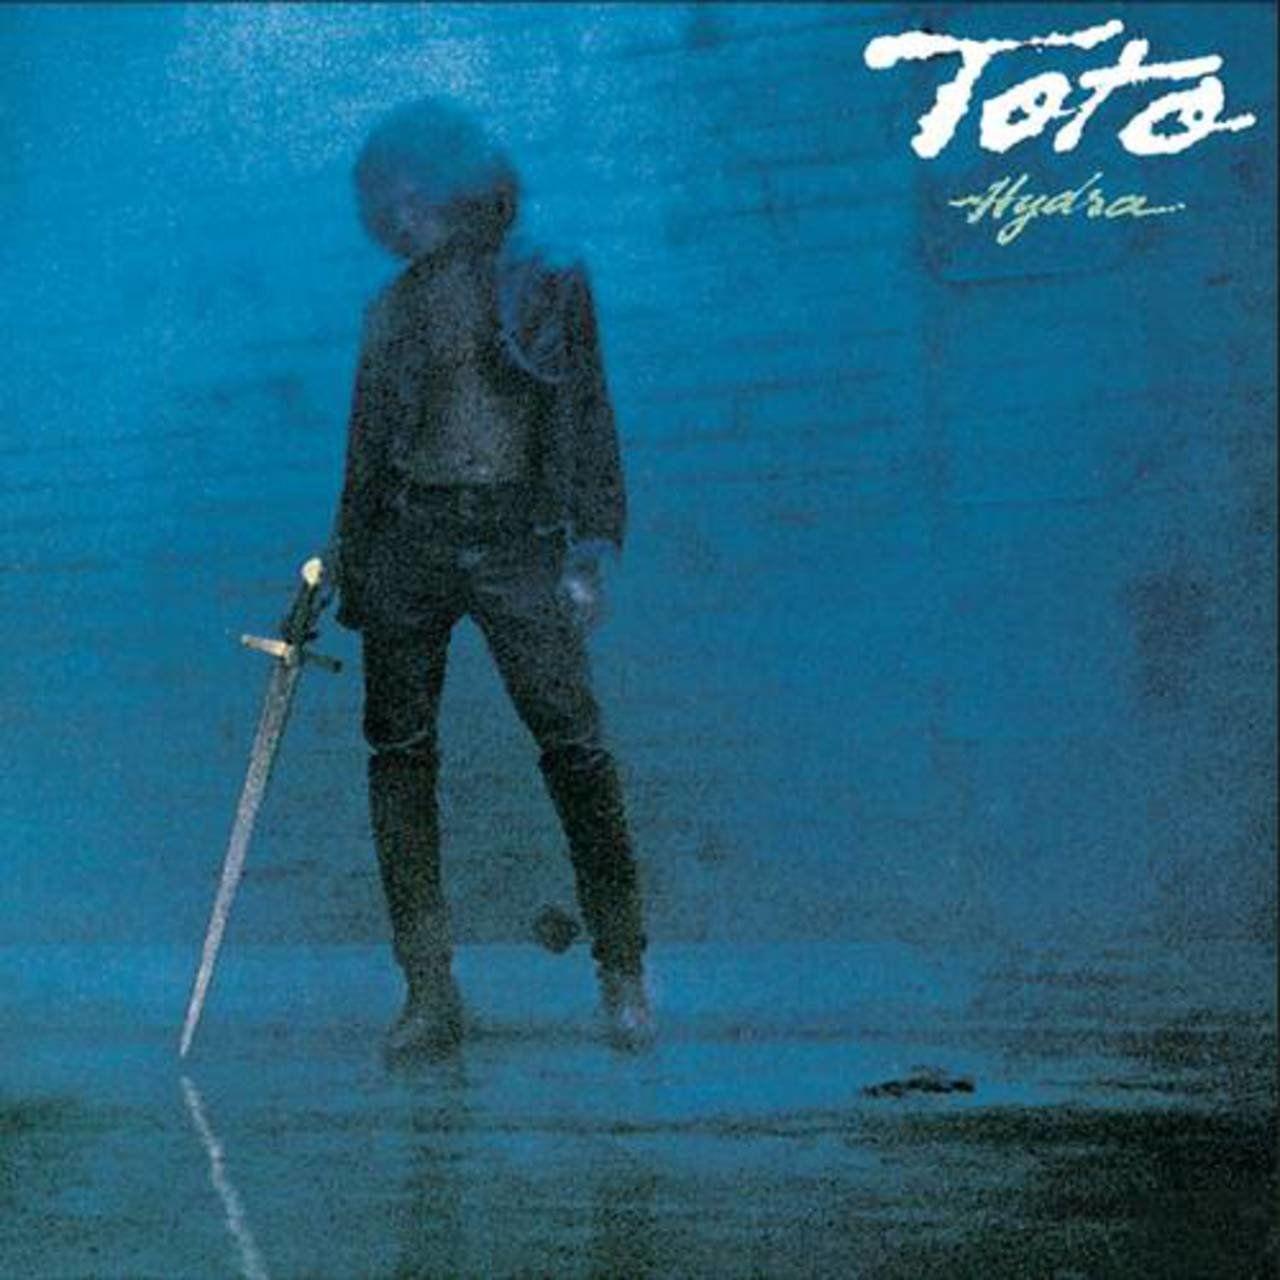 Toto Hydra 1979 Vinyl Records Classic Album Covers Rock Album Covers